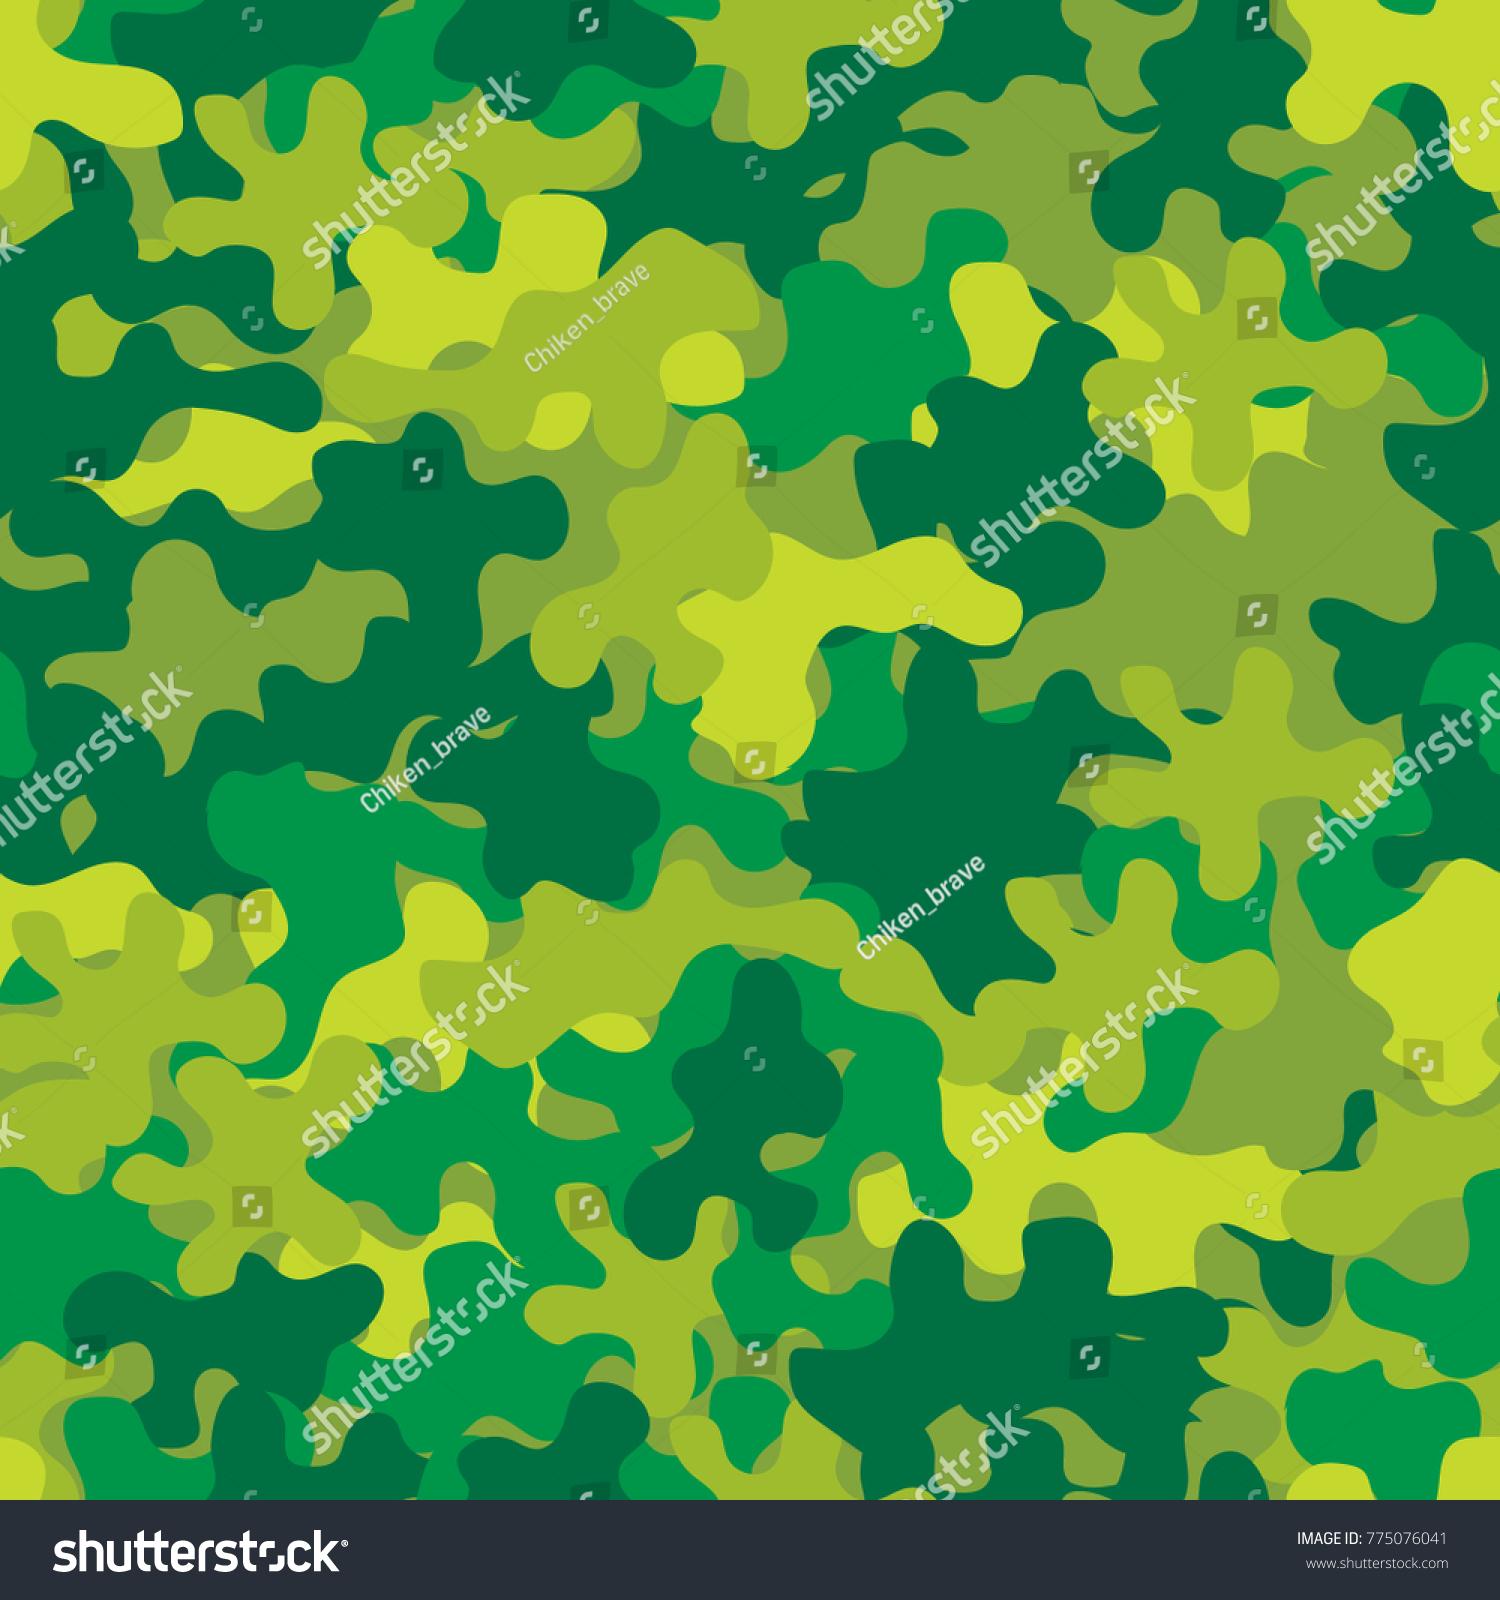 Camouflage pattern seamless background animal military stock vector camouflage pattern seamless background animal military camouflage abstract seamless pattern for army hunting toneelgroepblik Choice Image